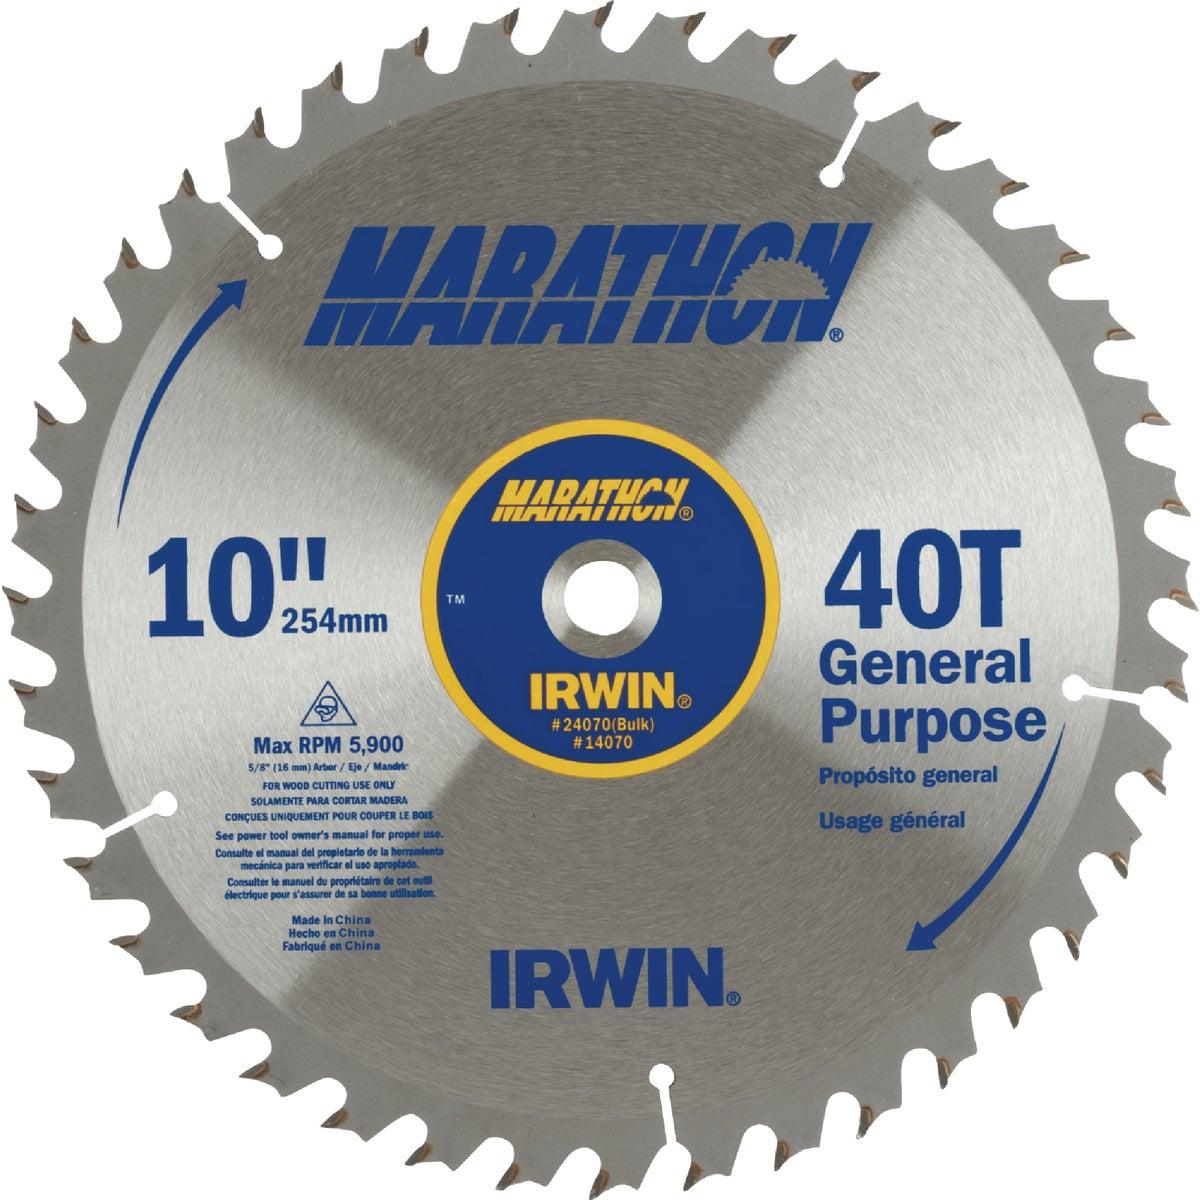 "10"" 40T MARATHON BLADE - 14070 by Irwin Industr Tool"